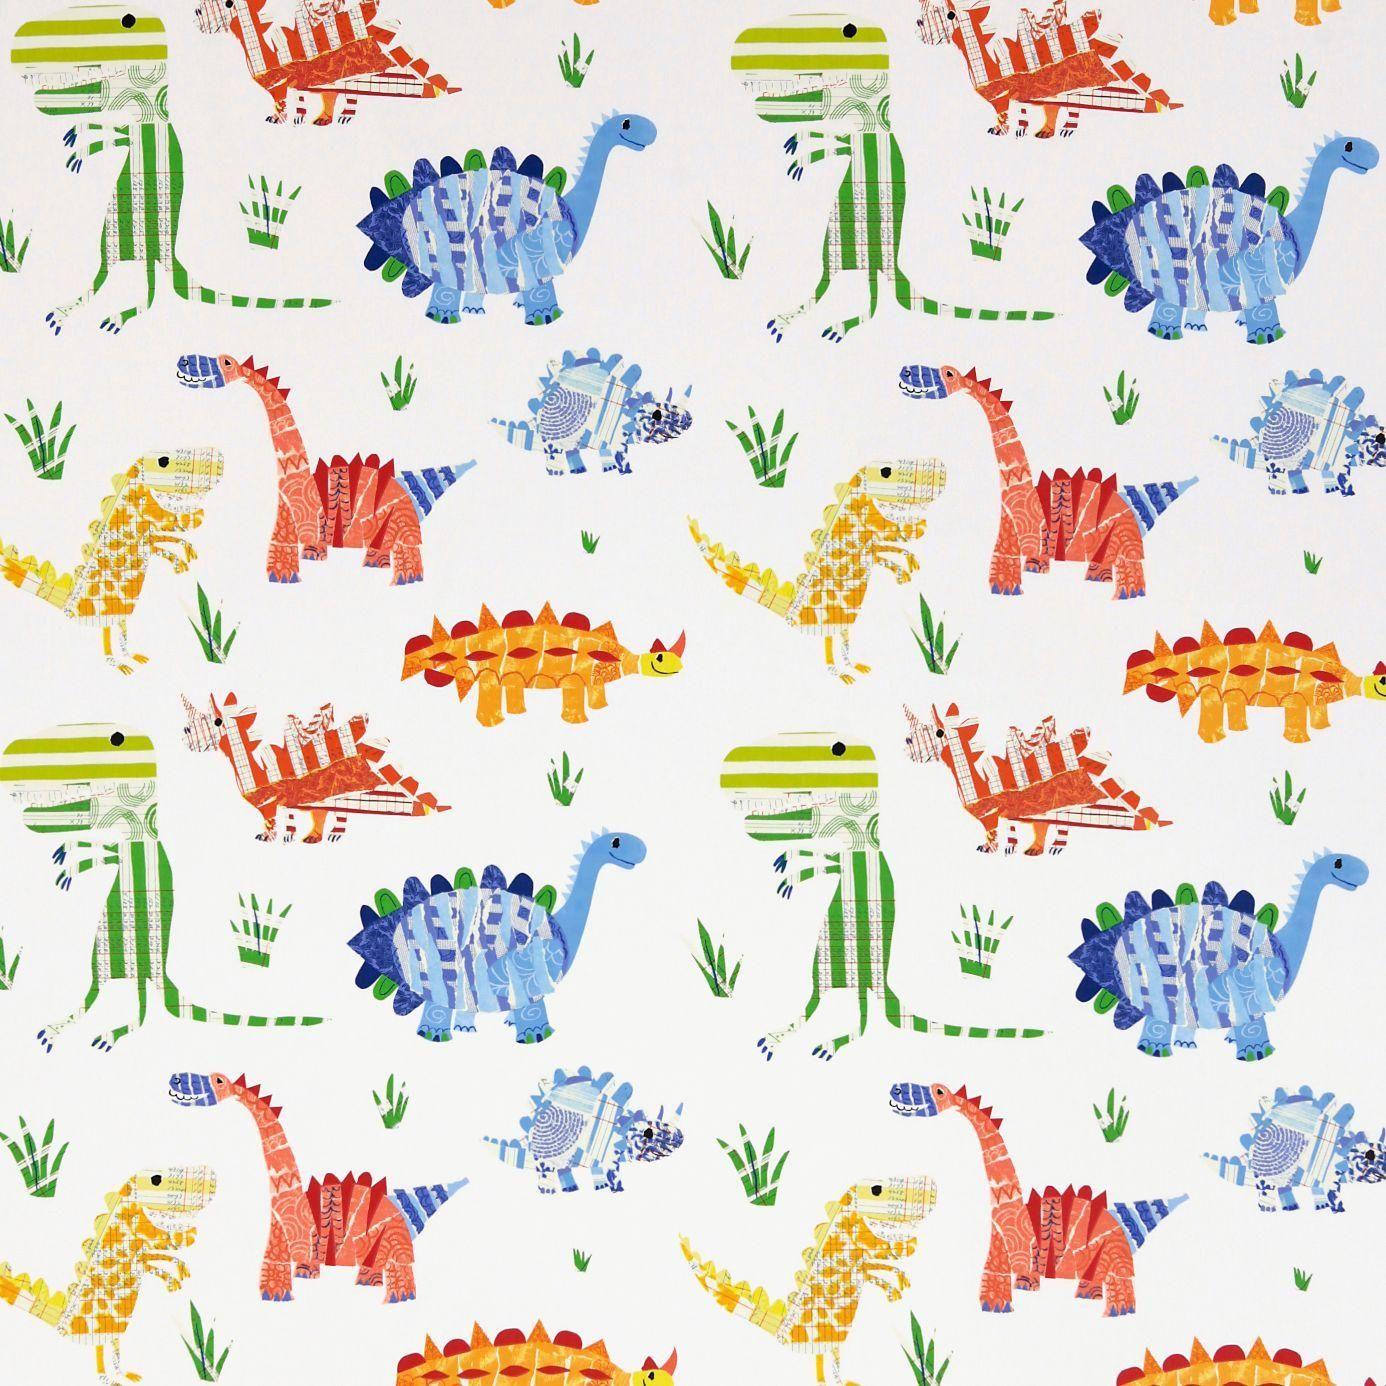 Kids Wallpaper For Bedroom Dinosaur Patterns Buscar Con Google Dinosaurios Grwww